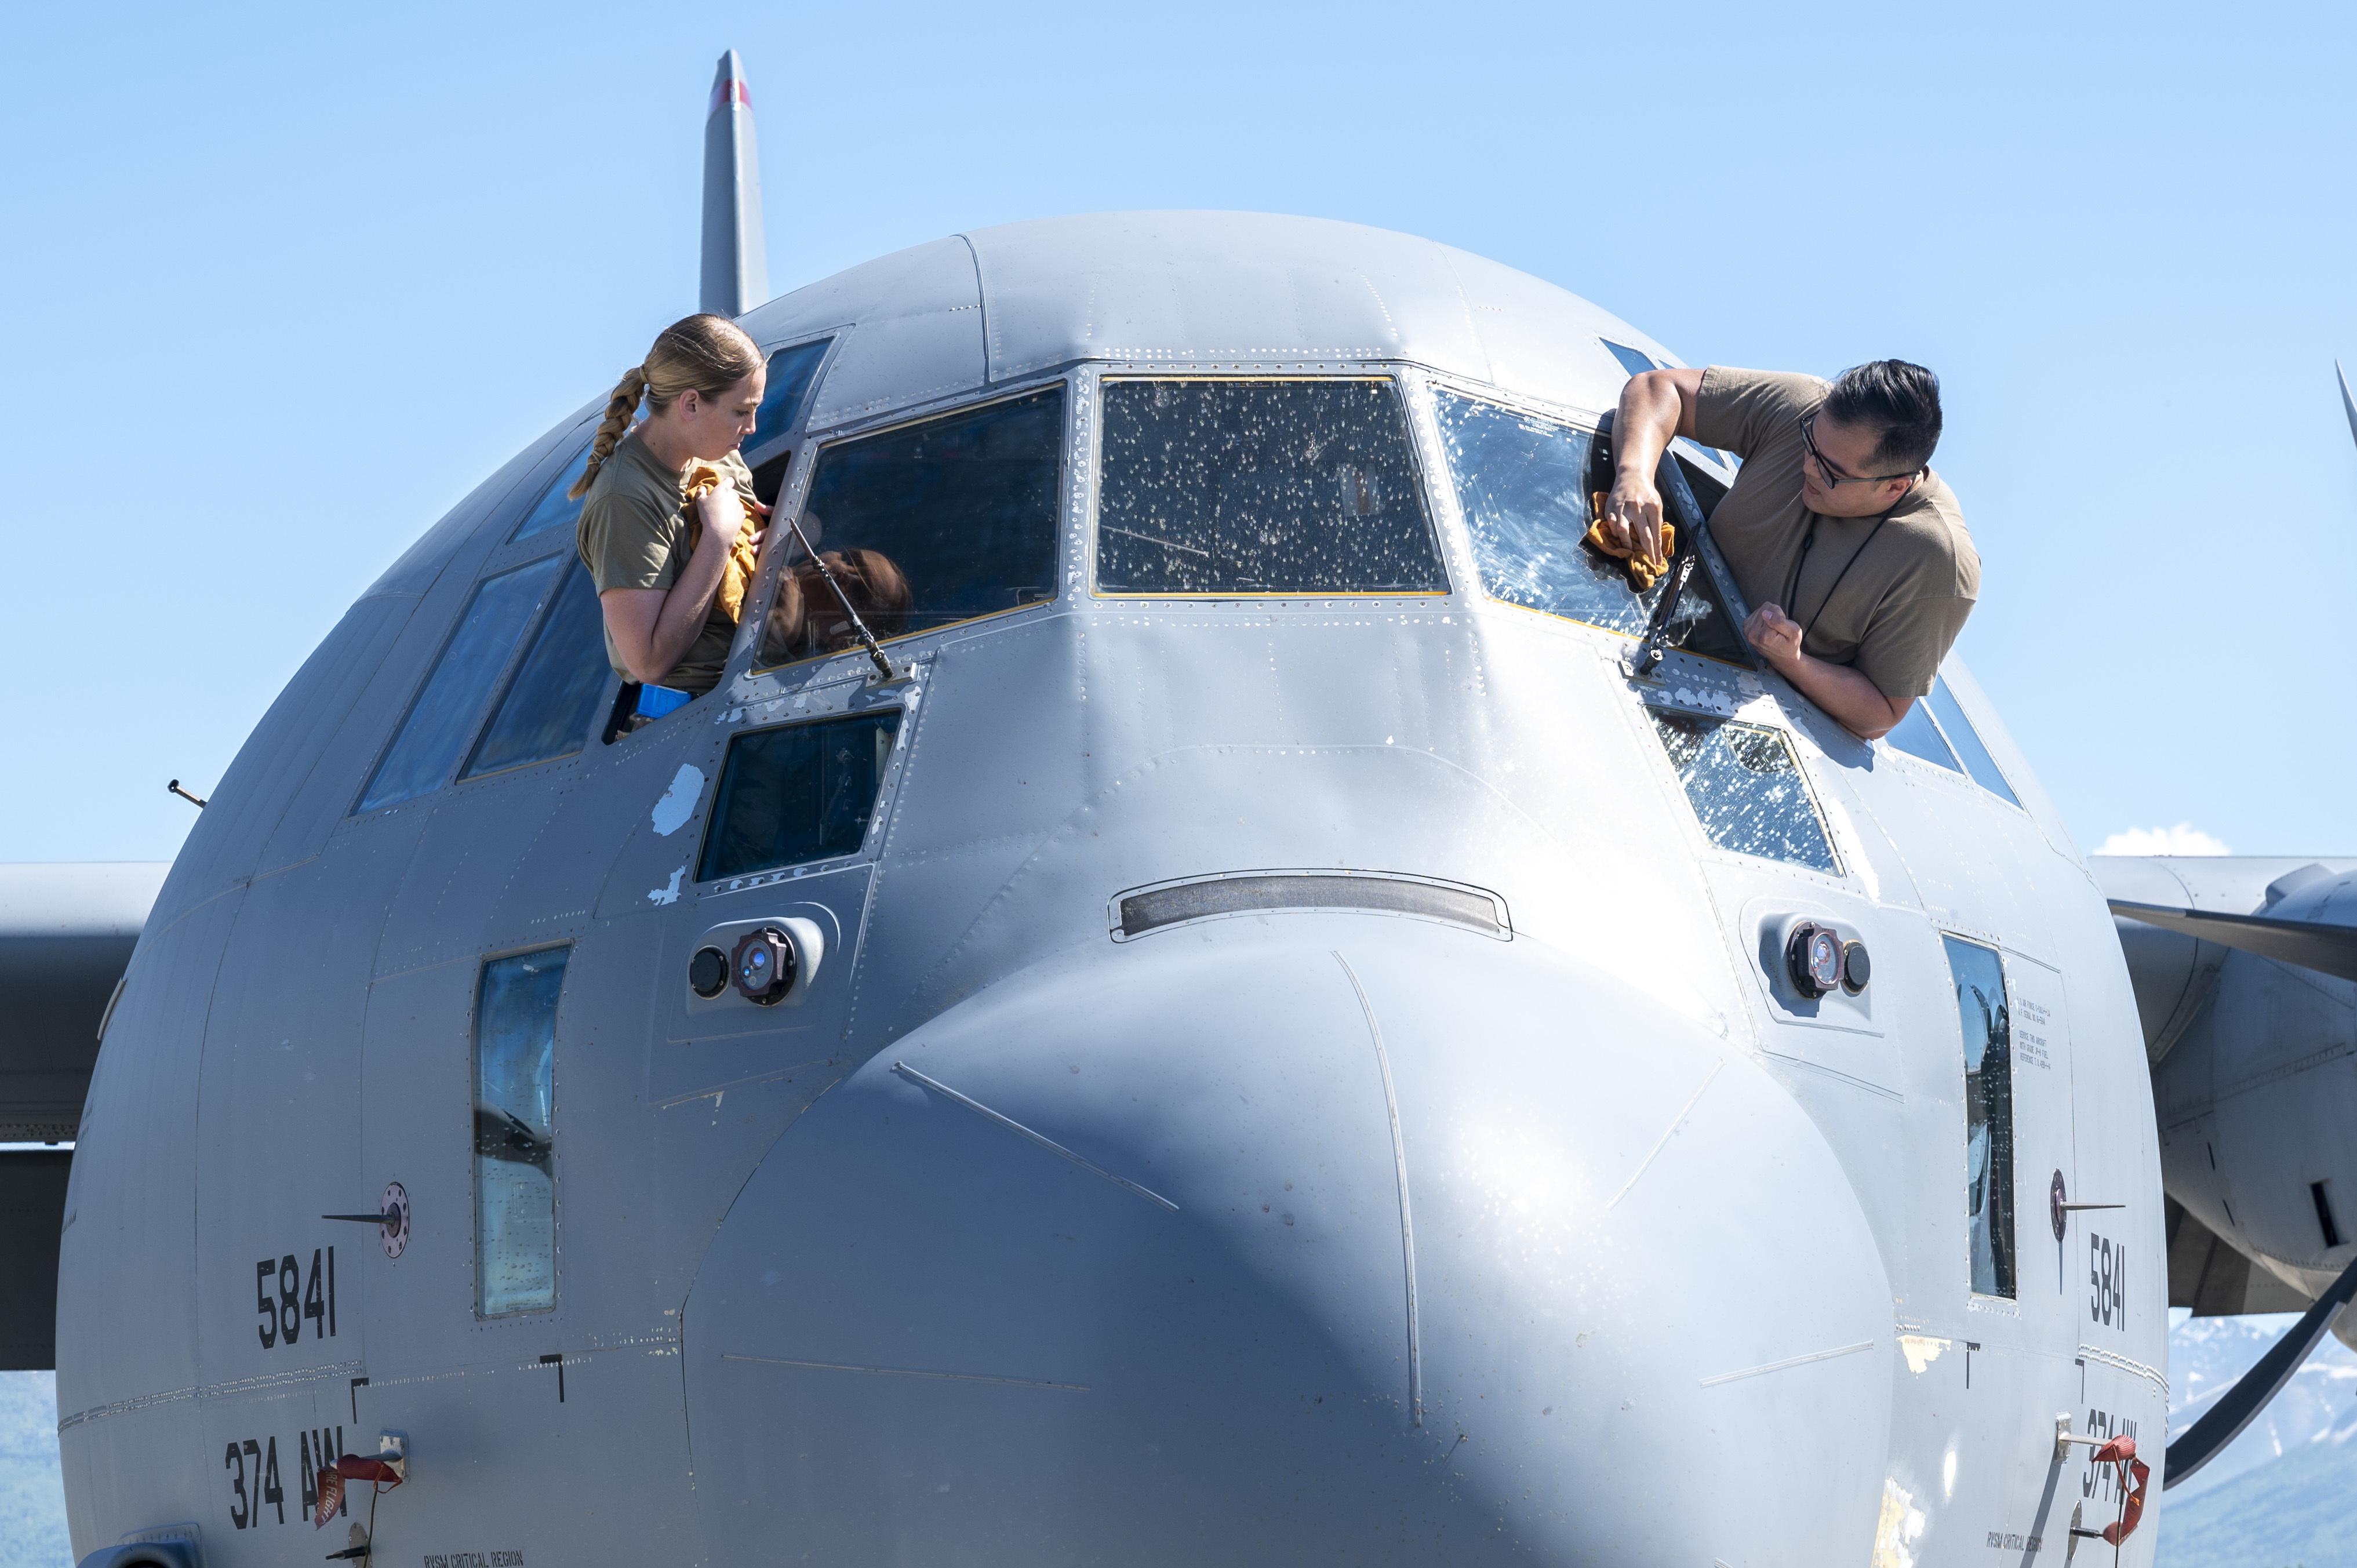 Airman 1st Class Sarah Miller and Senior Airman Austin Dihn, 374th Aircraft Maintenance Squadron, clean the windows of a C-130J Super Hercules during Red Flag-Alaska 21-2 at Joint Base Elmendorf-Richardson, Alaska, June 14. (Airman 1st Class Mario Calabro/Air Force)